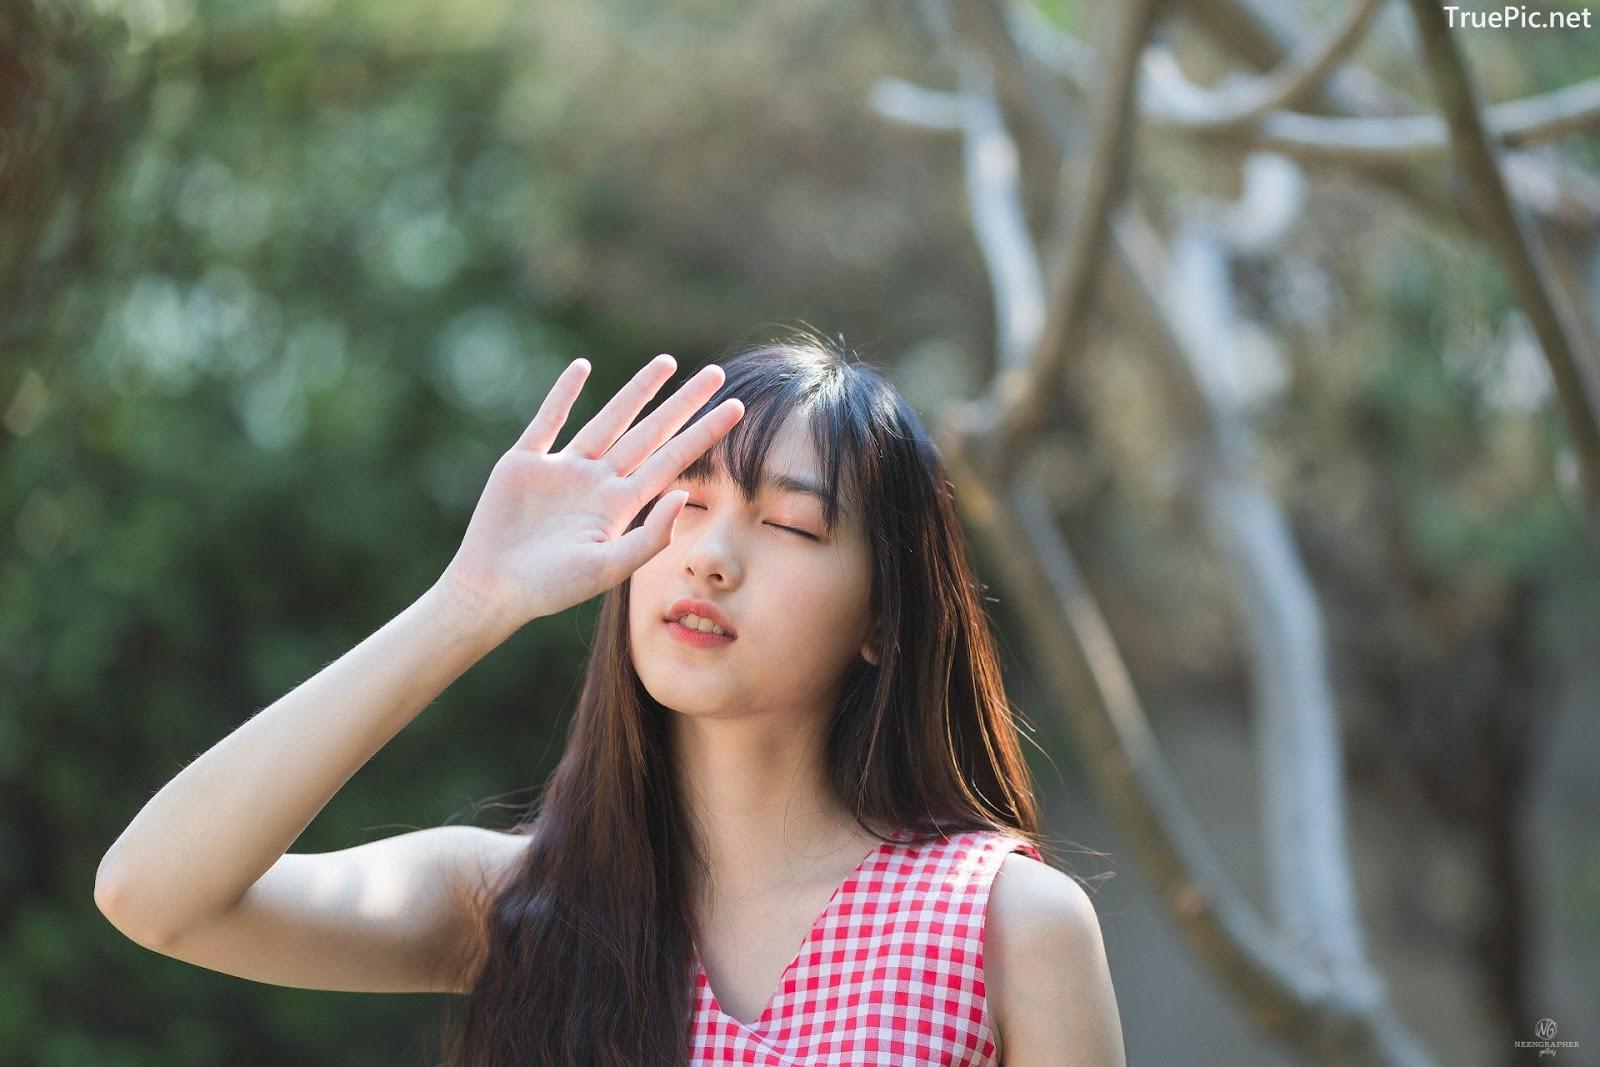 Image-Thailand-Cute-Model-Emma-Panisara–Album-Emma-Bright-Sunday-TruePic.net- Picture-28